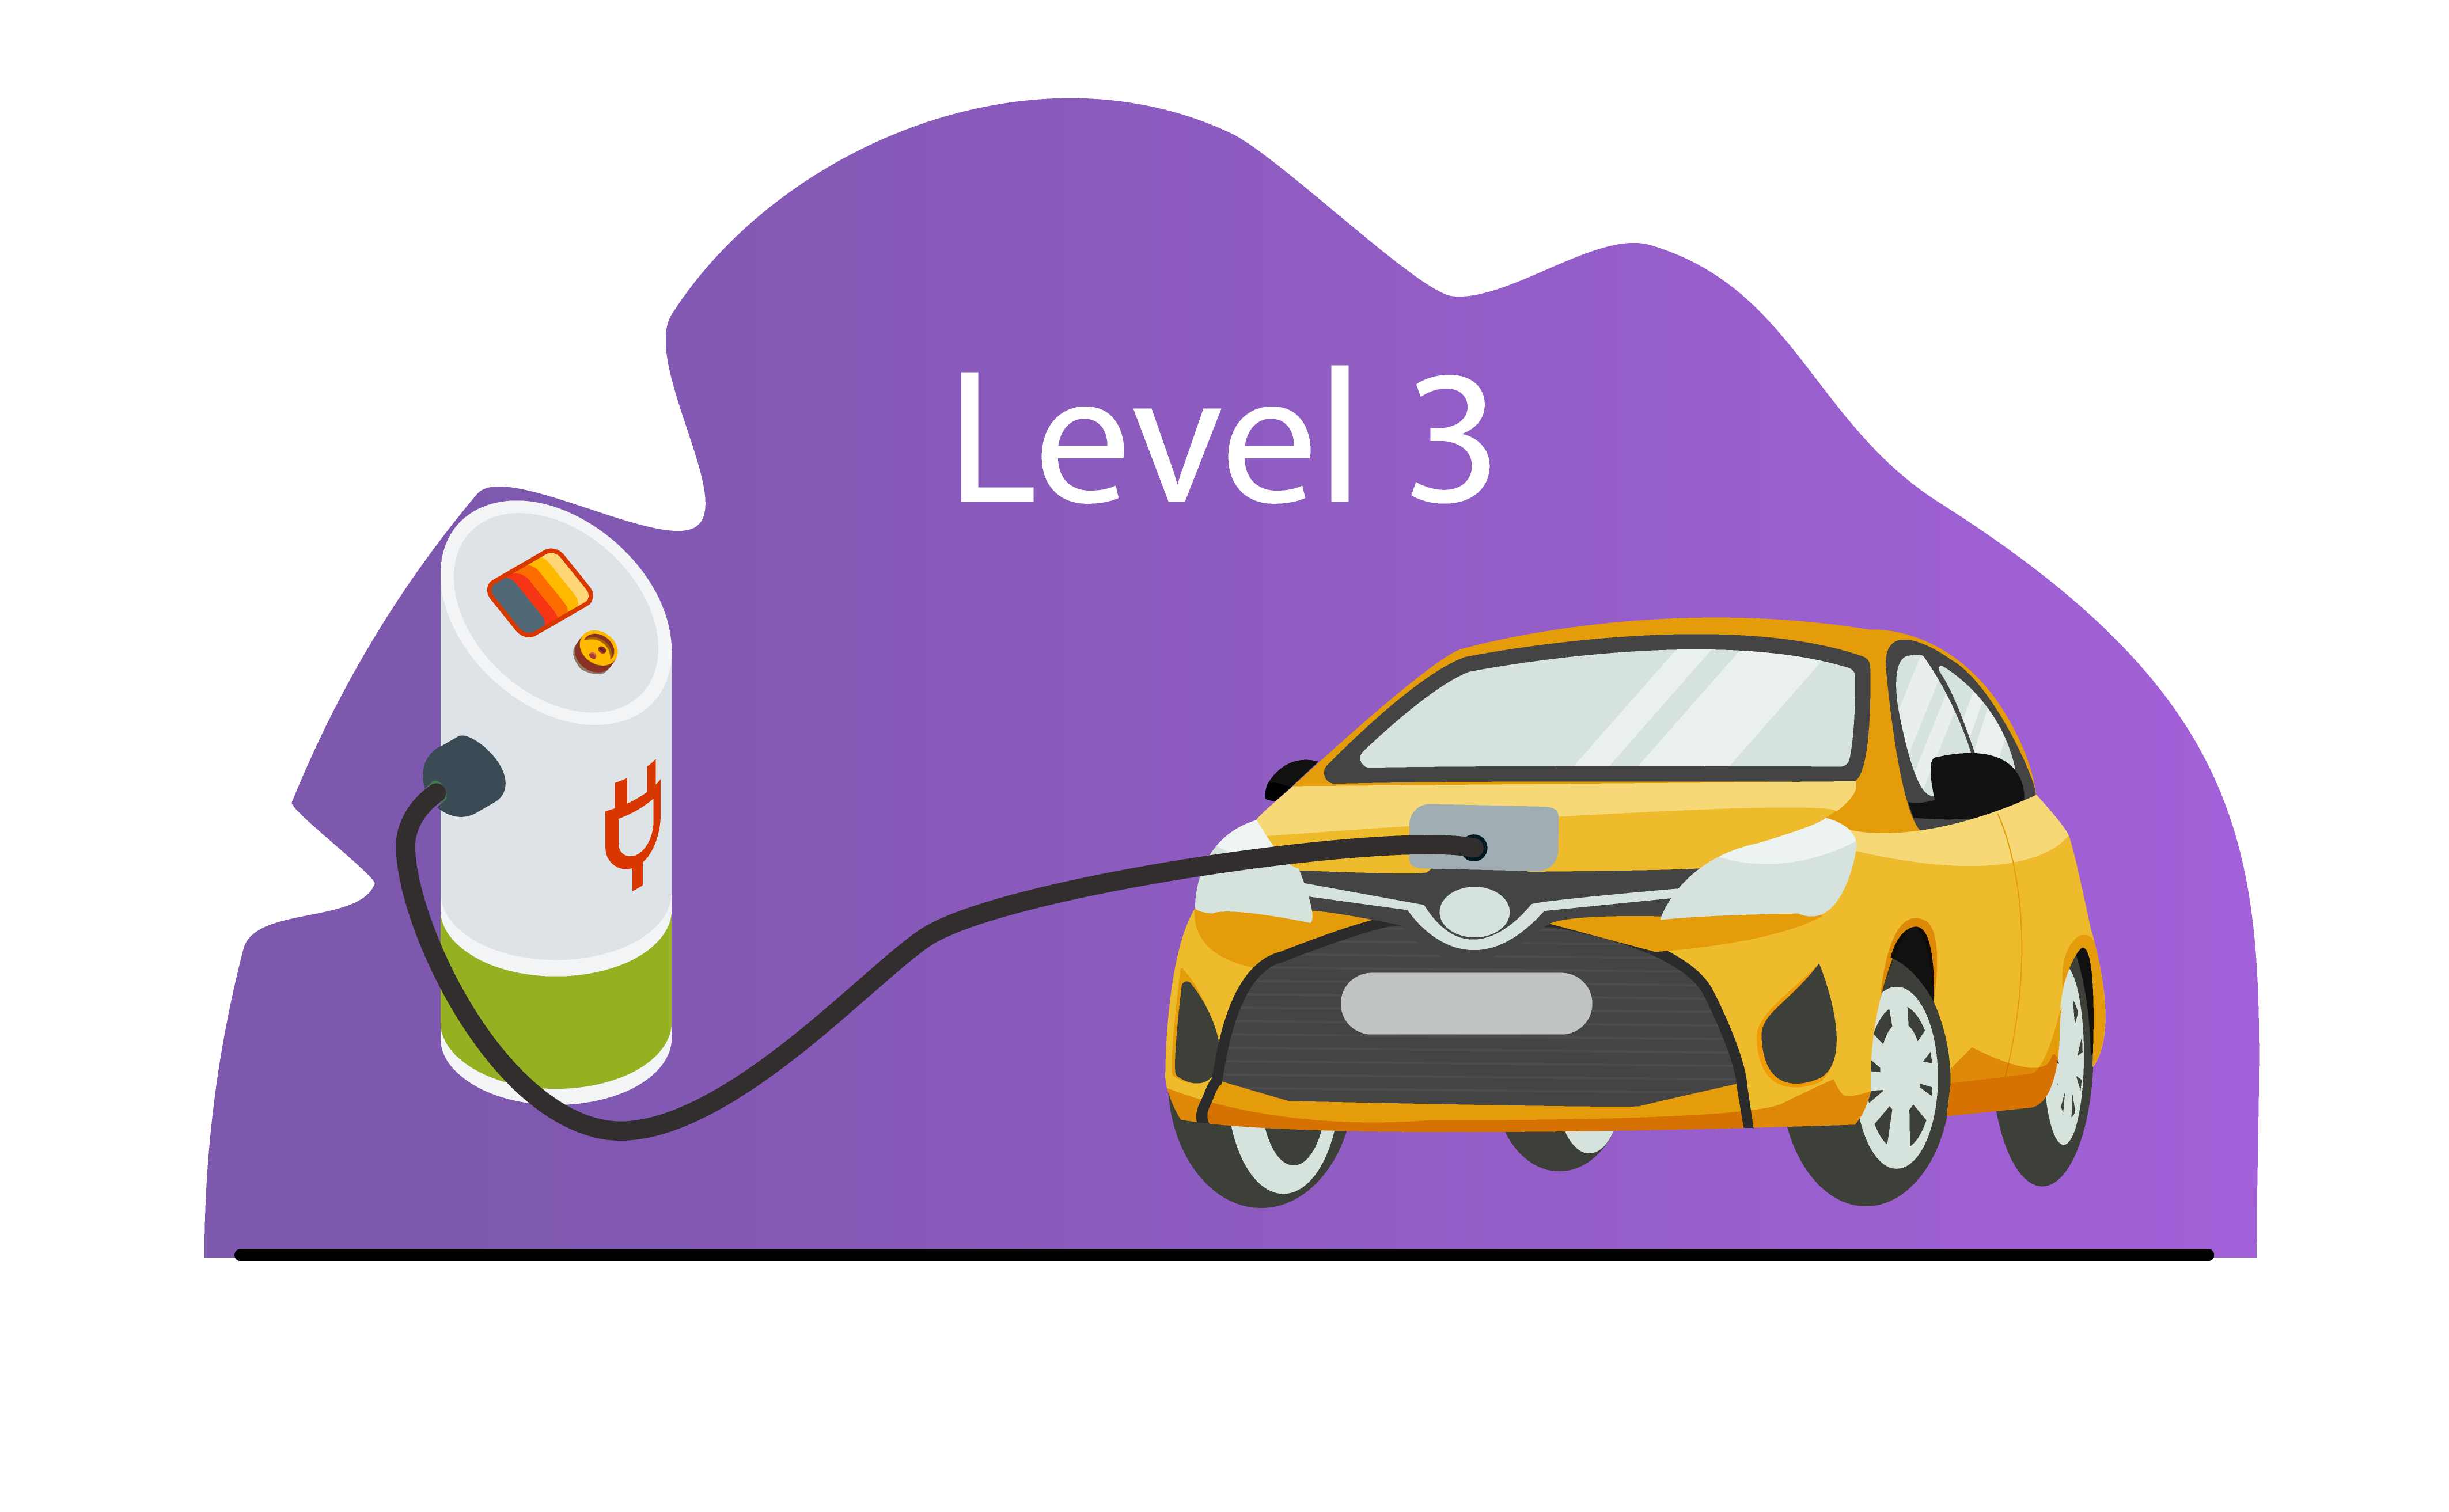 Level 3 charging EV